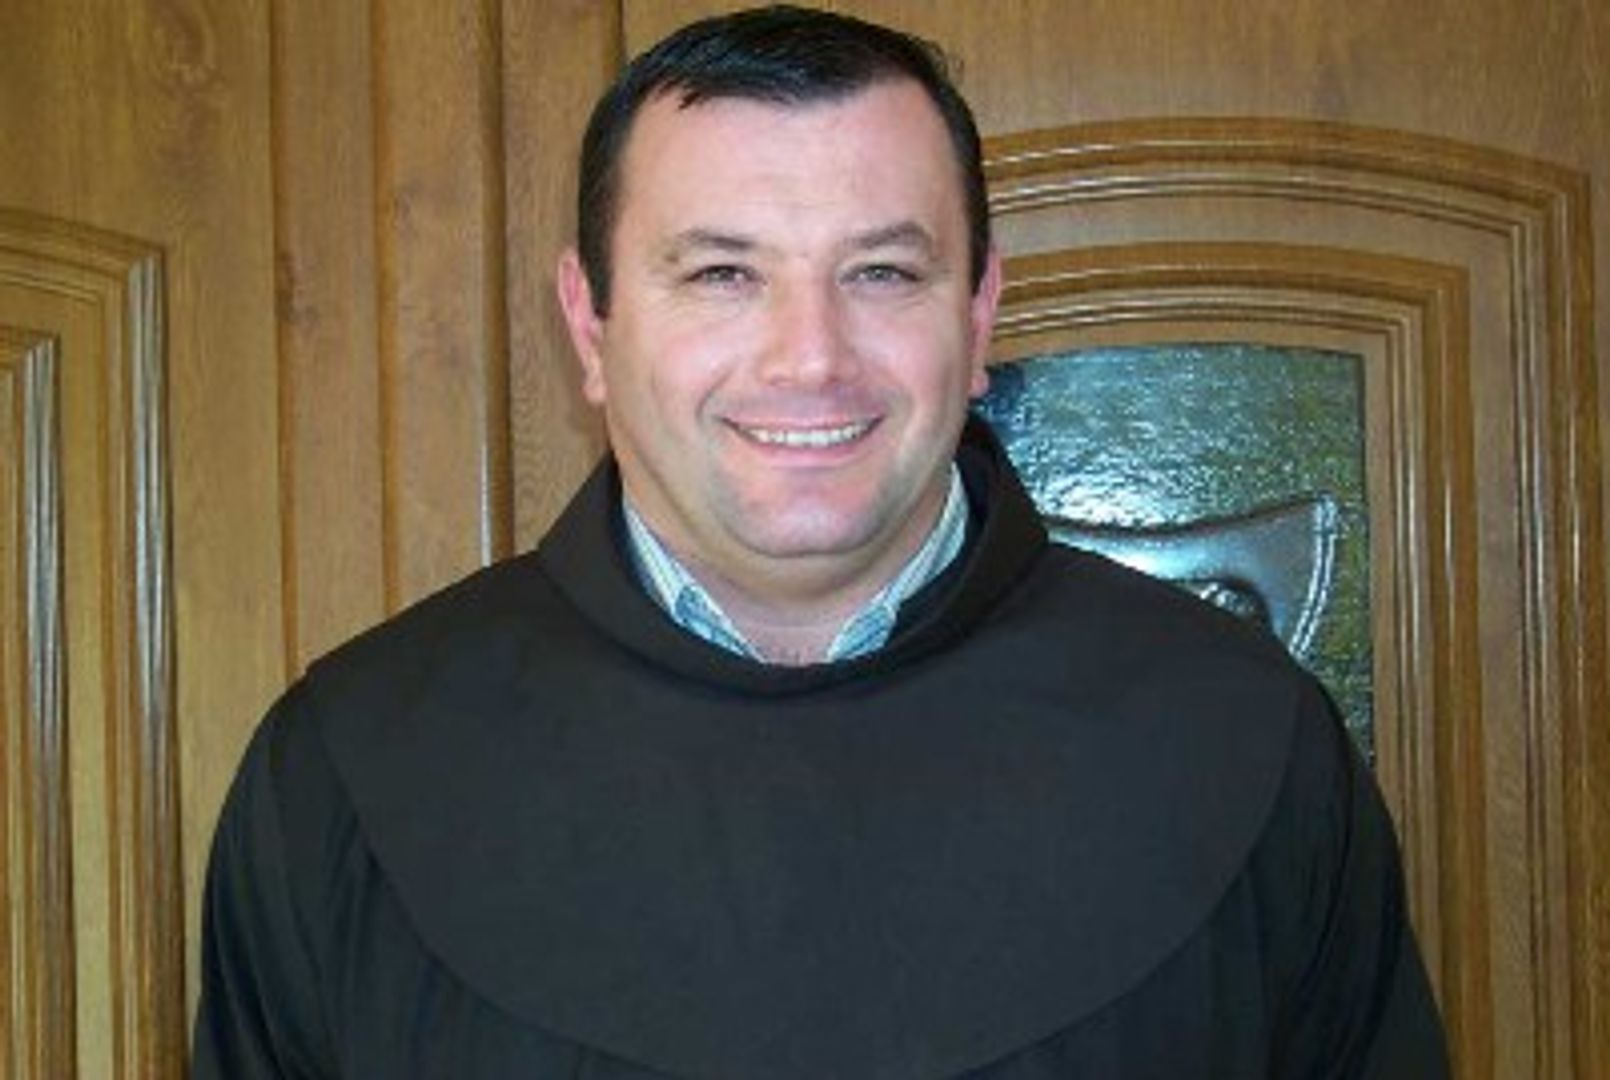 Pater Danko Perutina